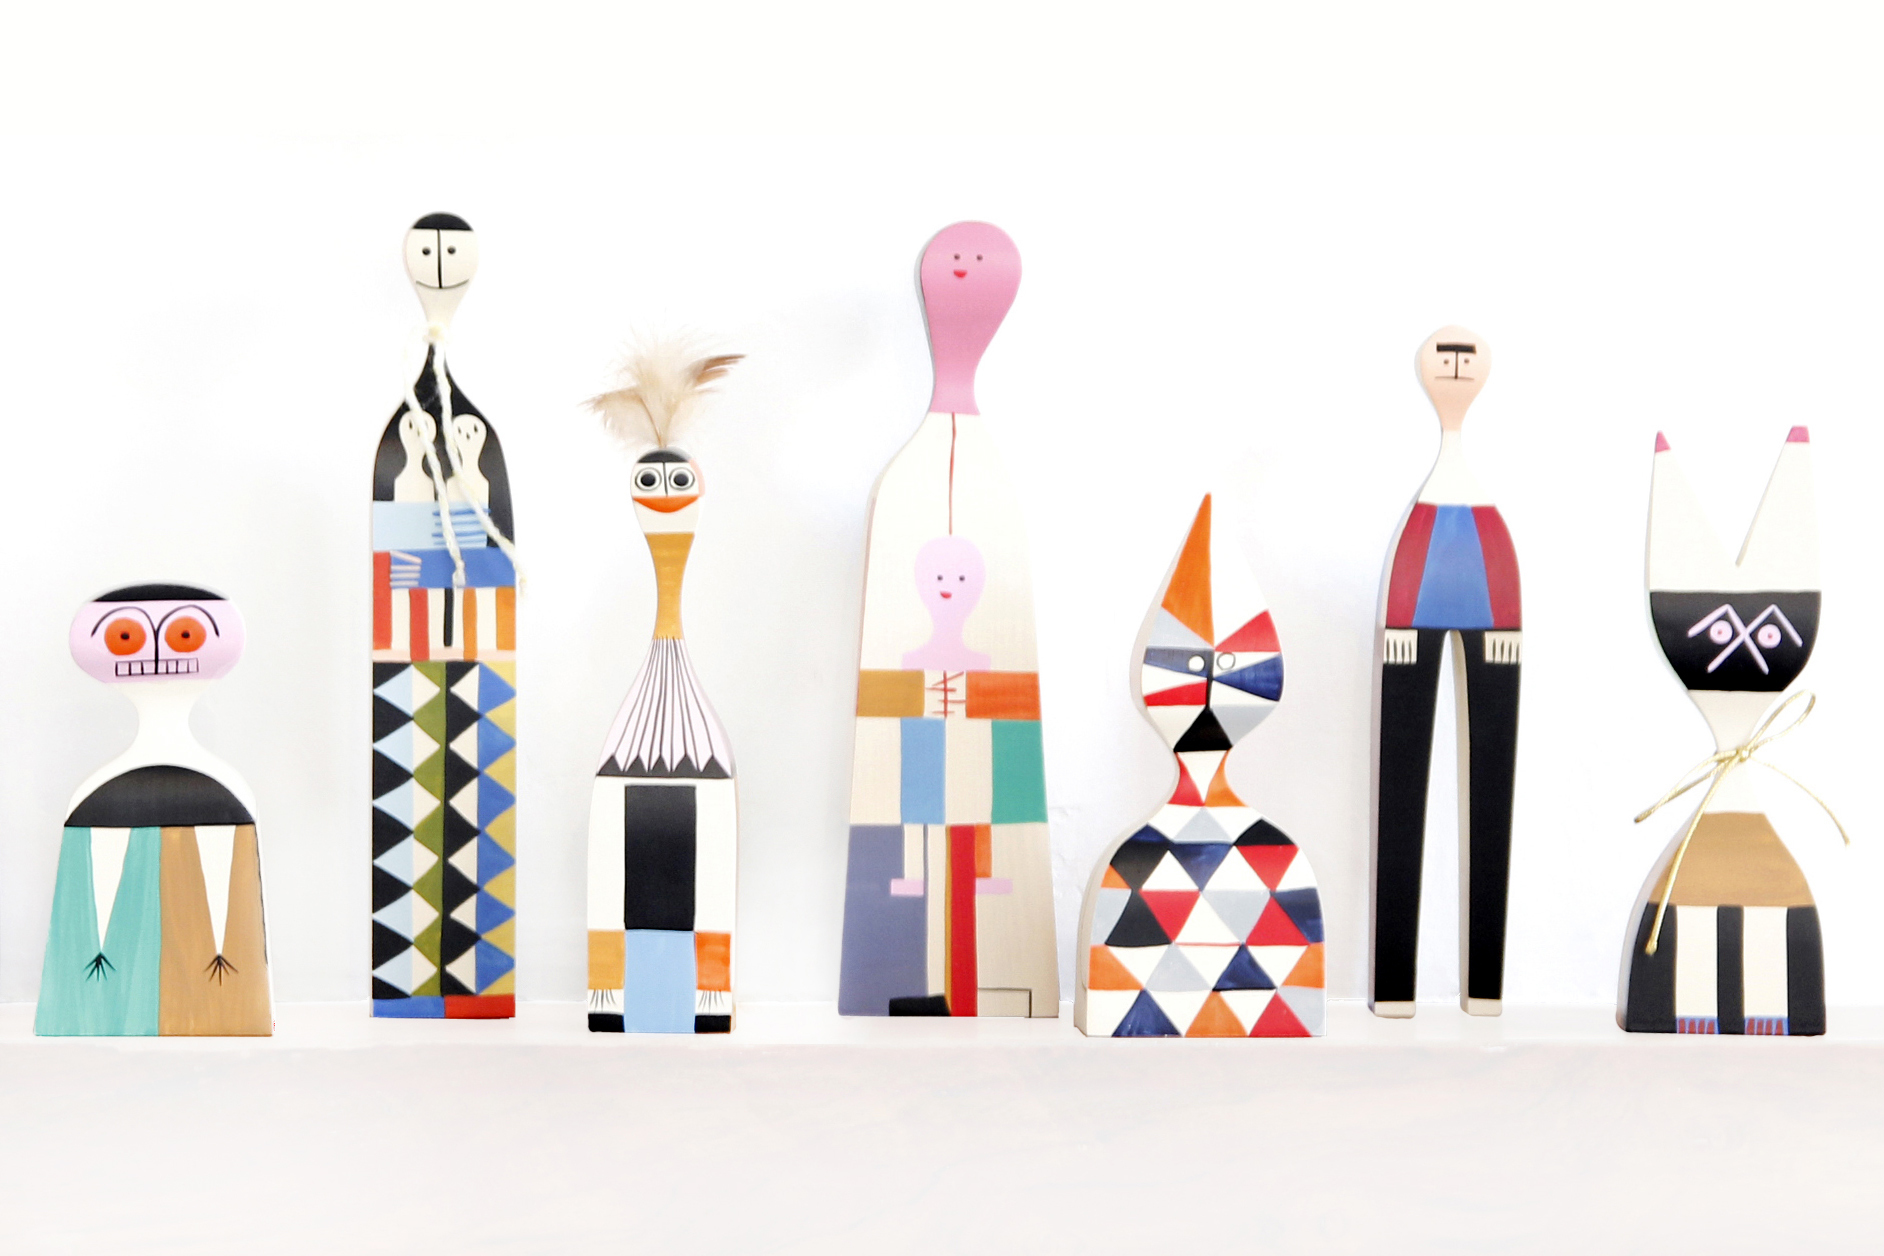 Alexander Girard's wooden dolls inspired us this week!